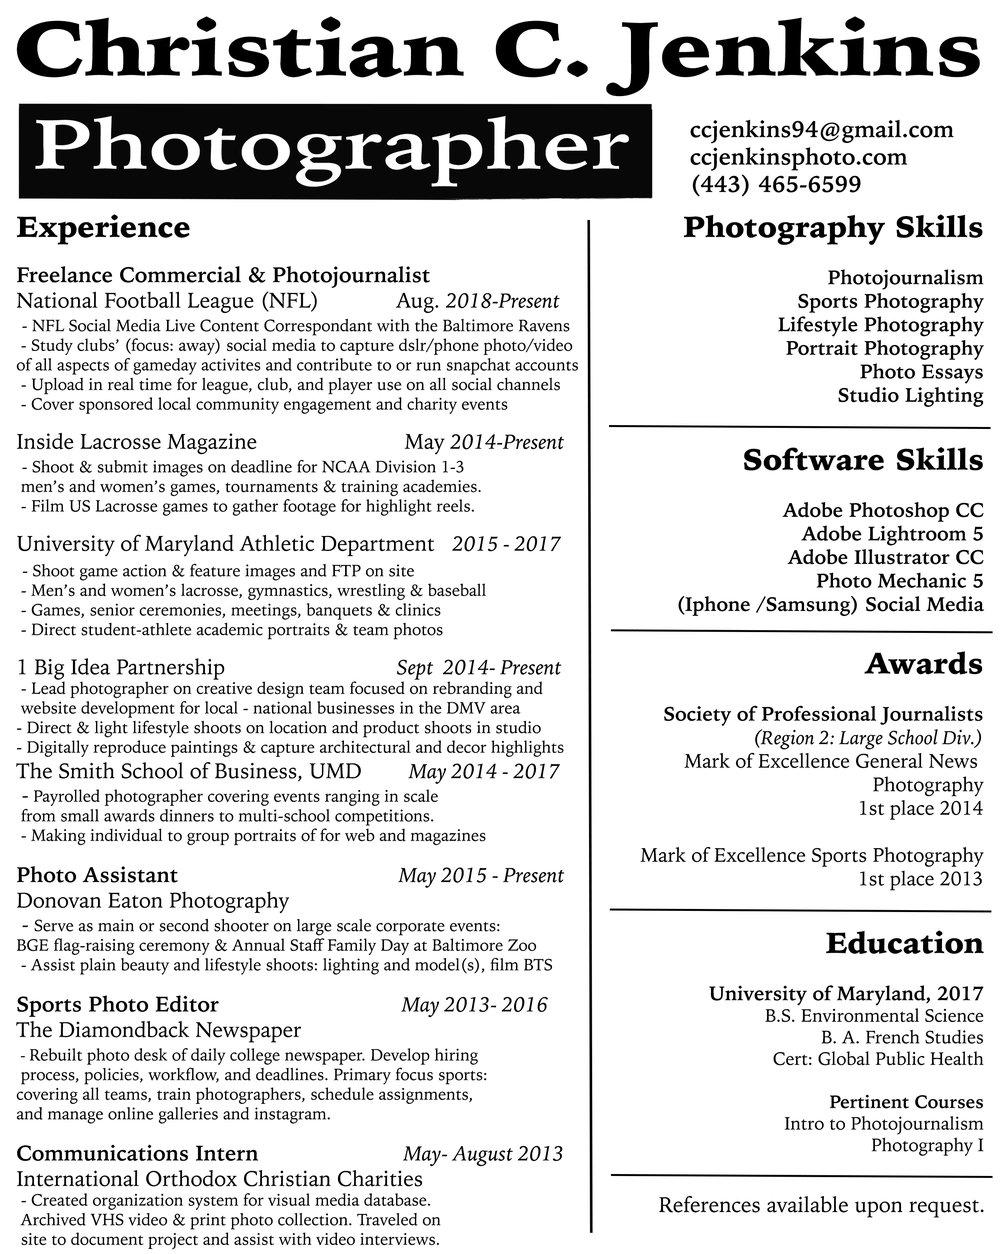 Resume Christian C Jenkins Photography